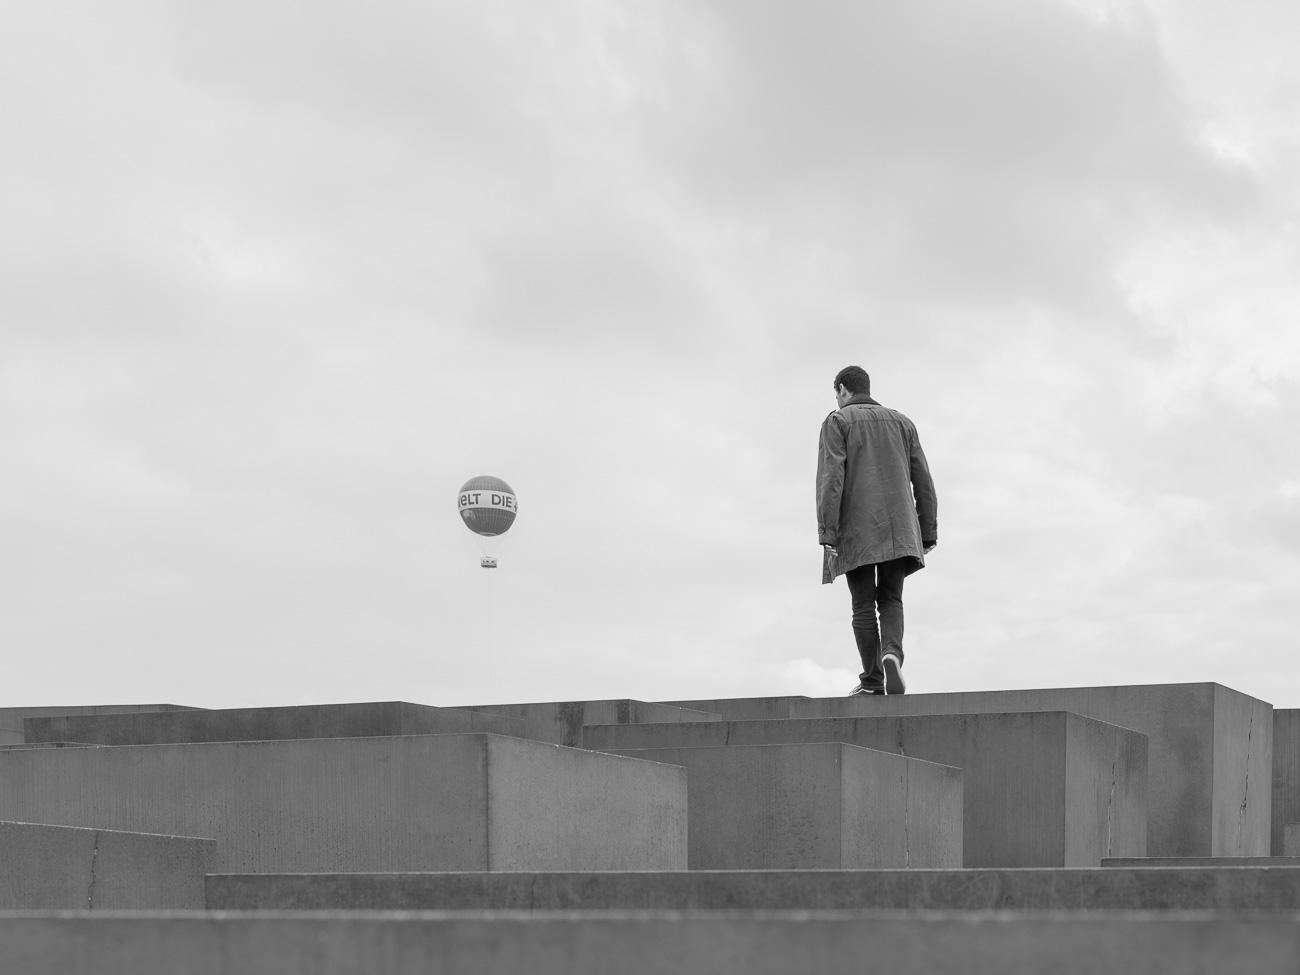 Berlin Foto Holocaust Mahnmal Martin U Waltz